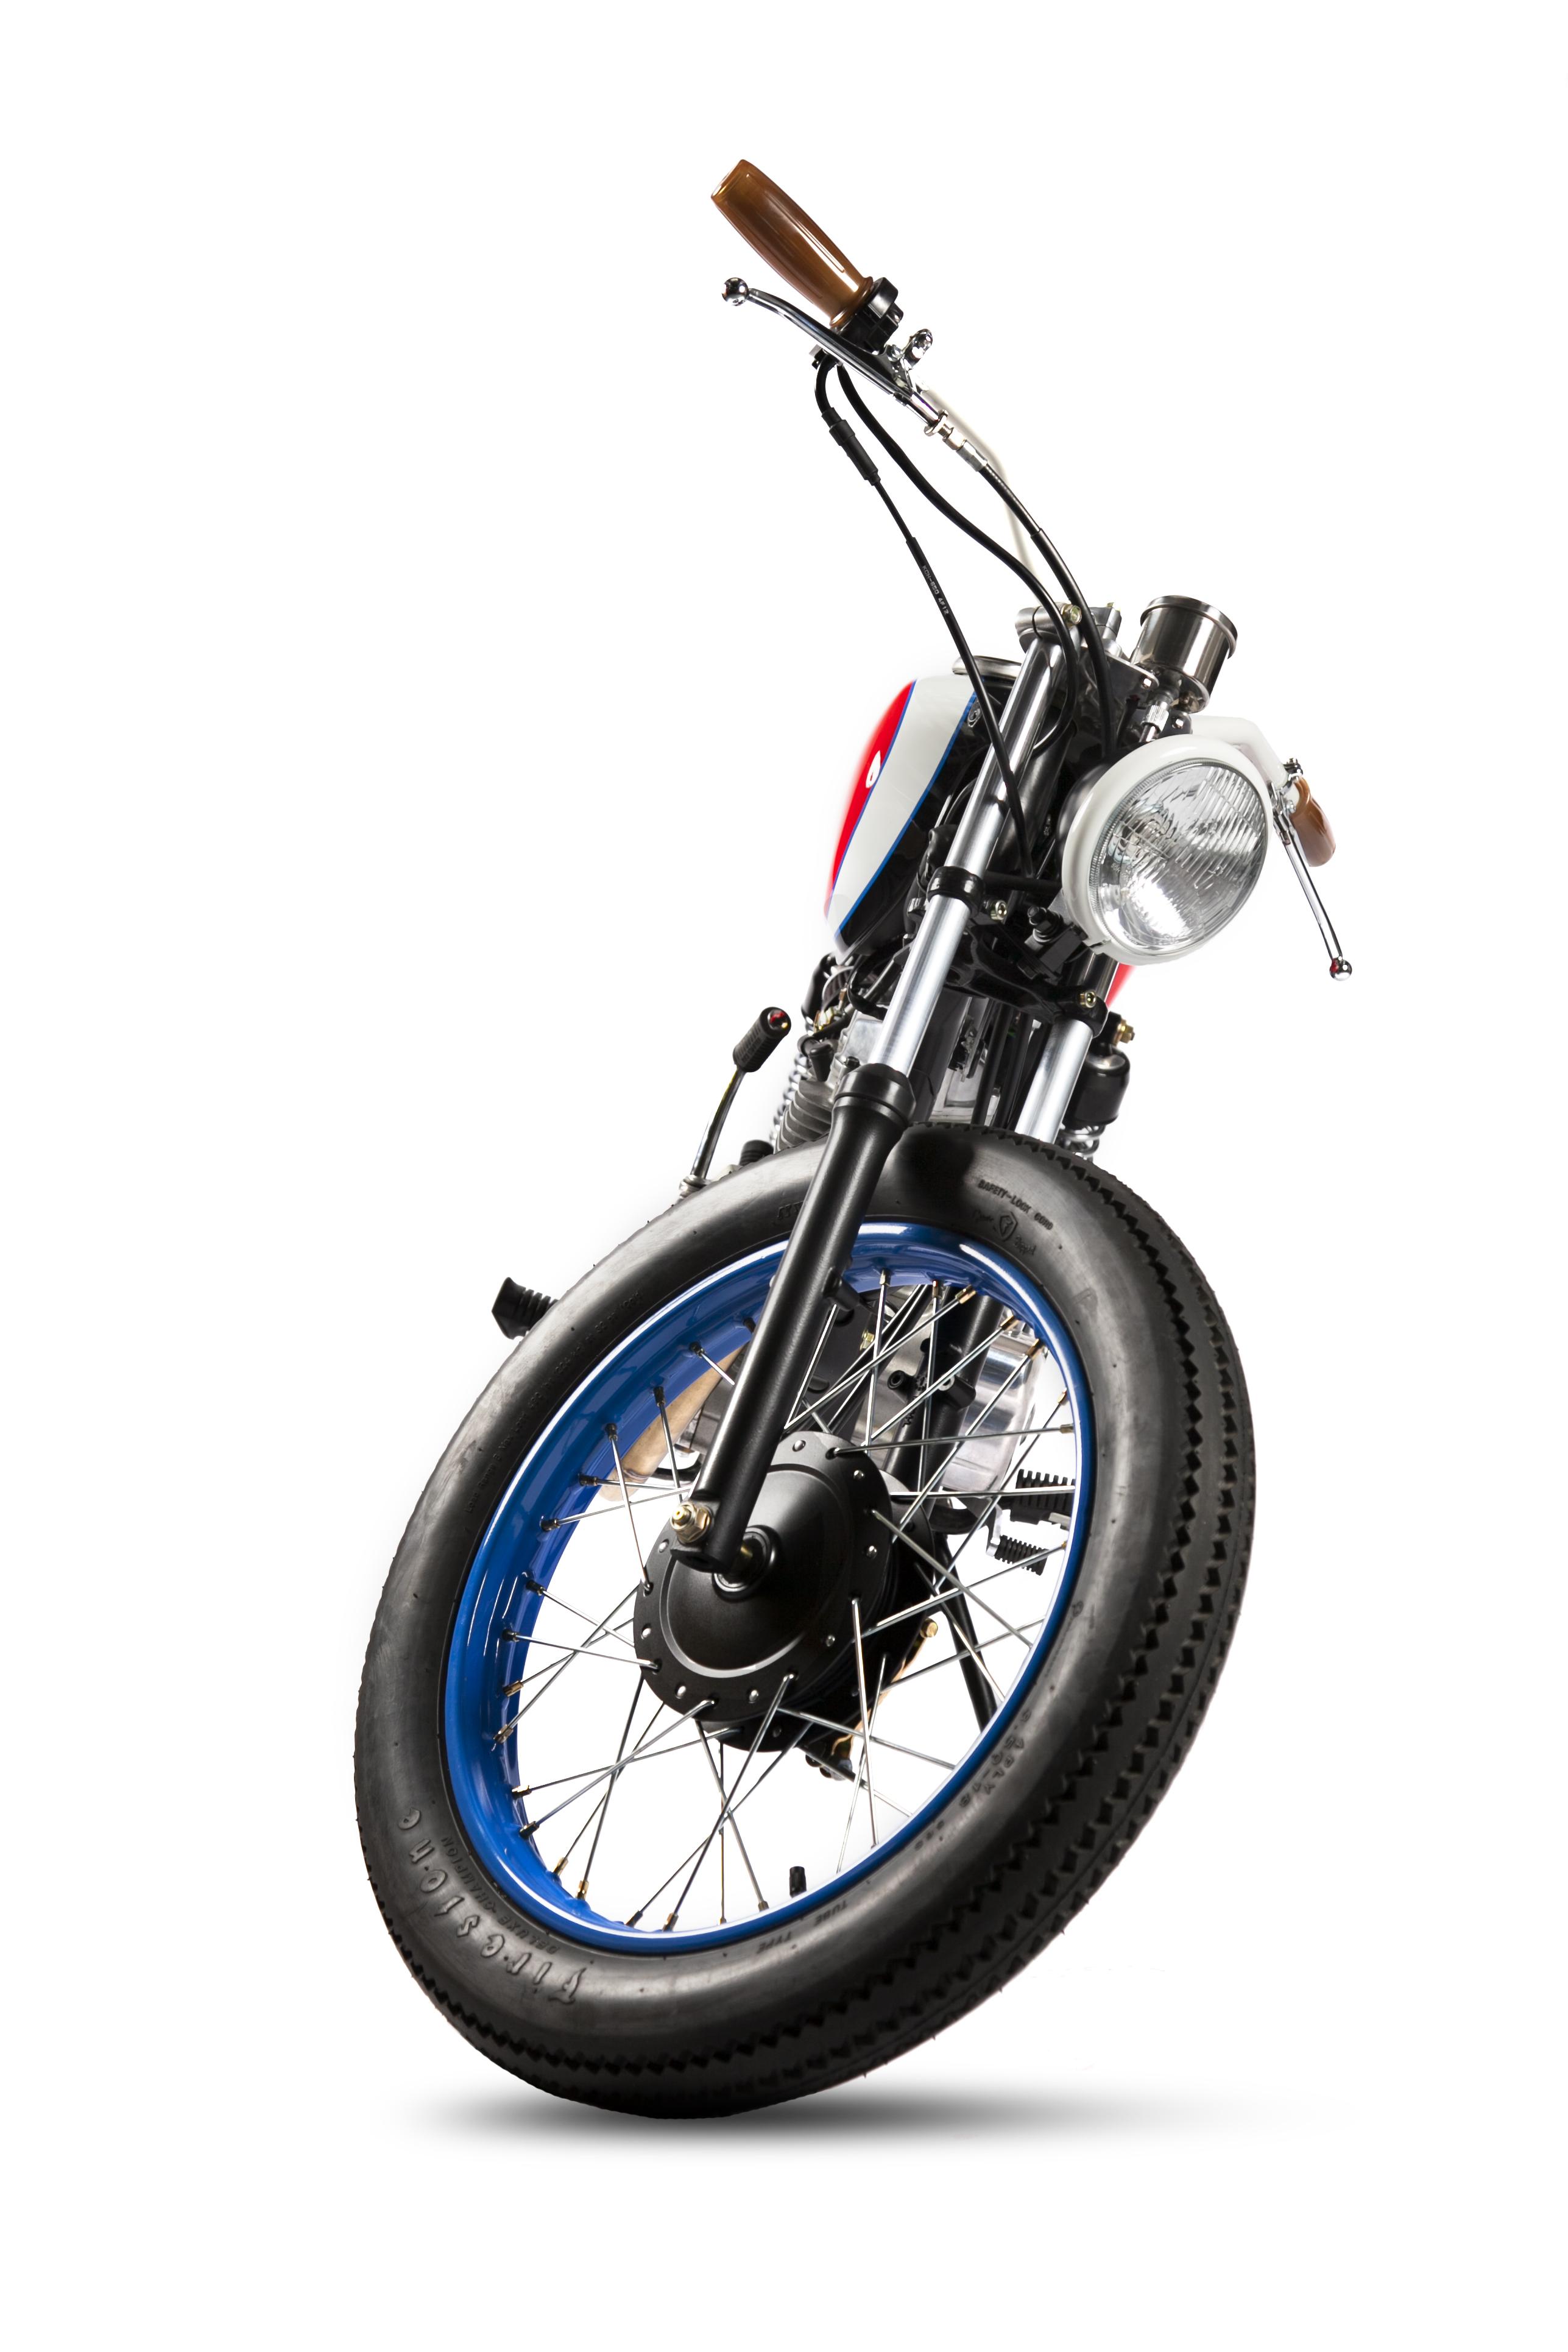 maria_motorcycles_honda_cg125_beladonna_3821